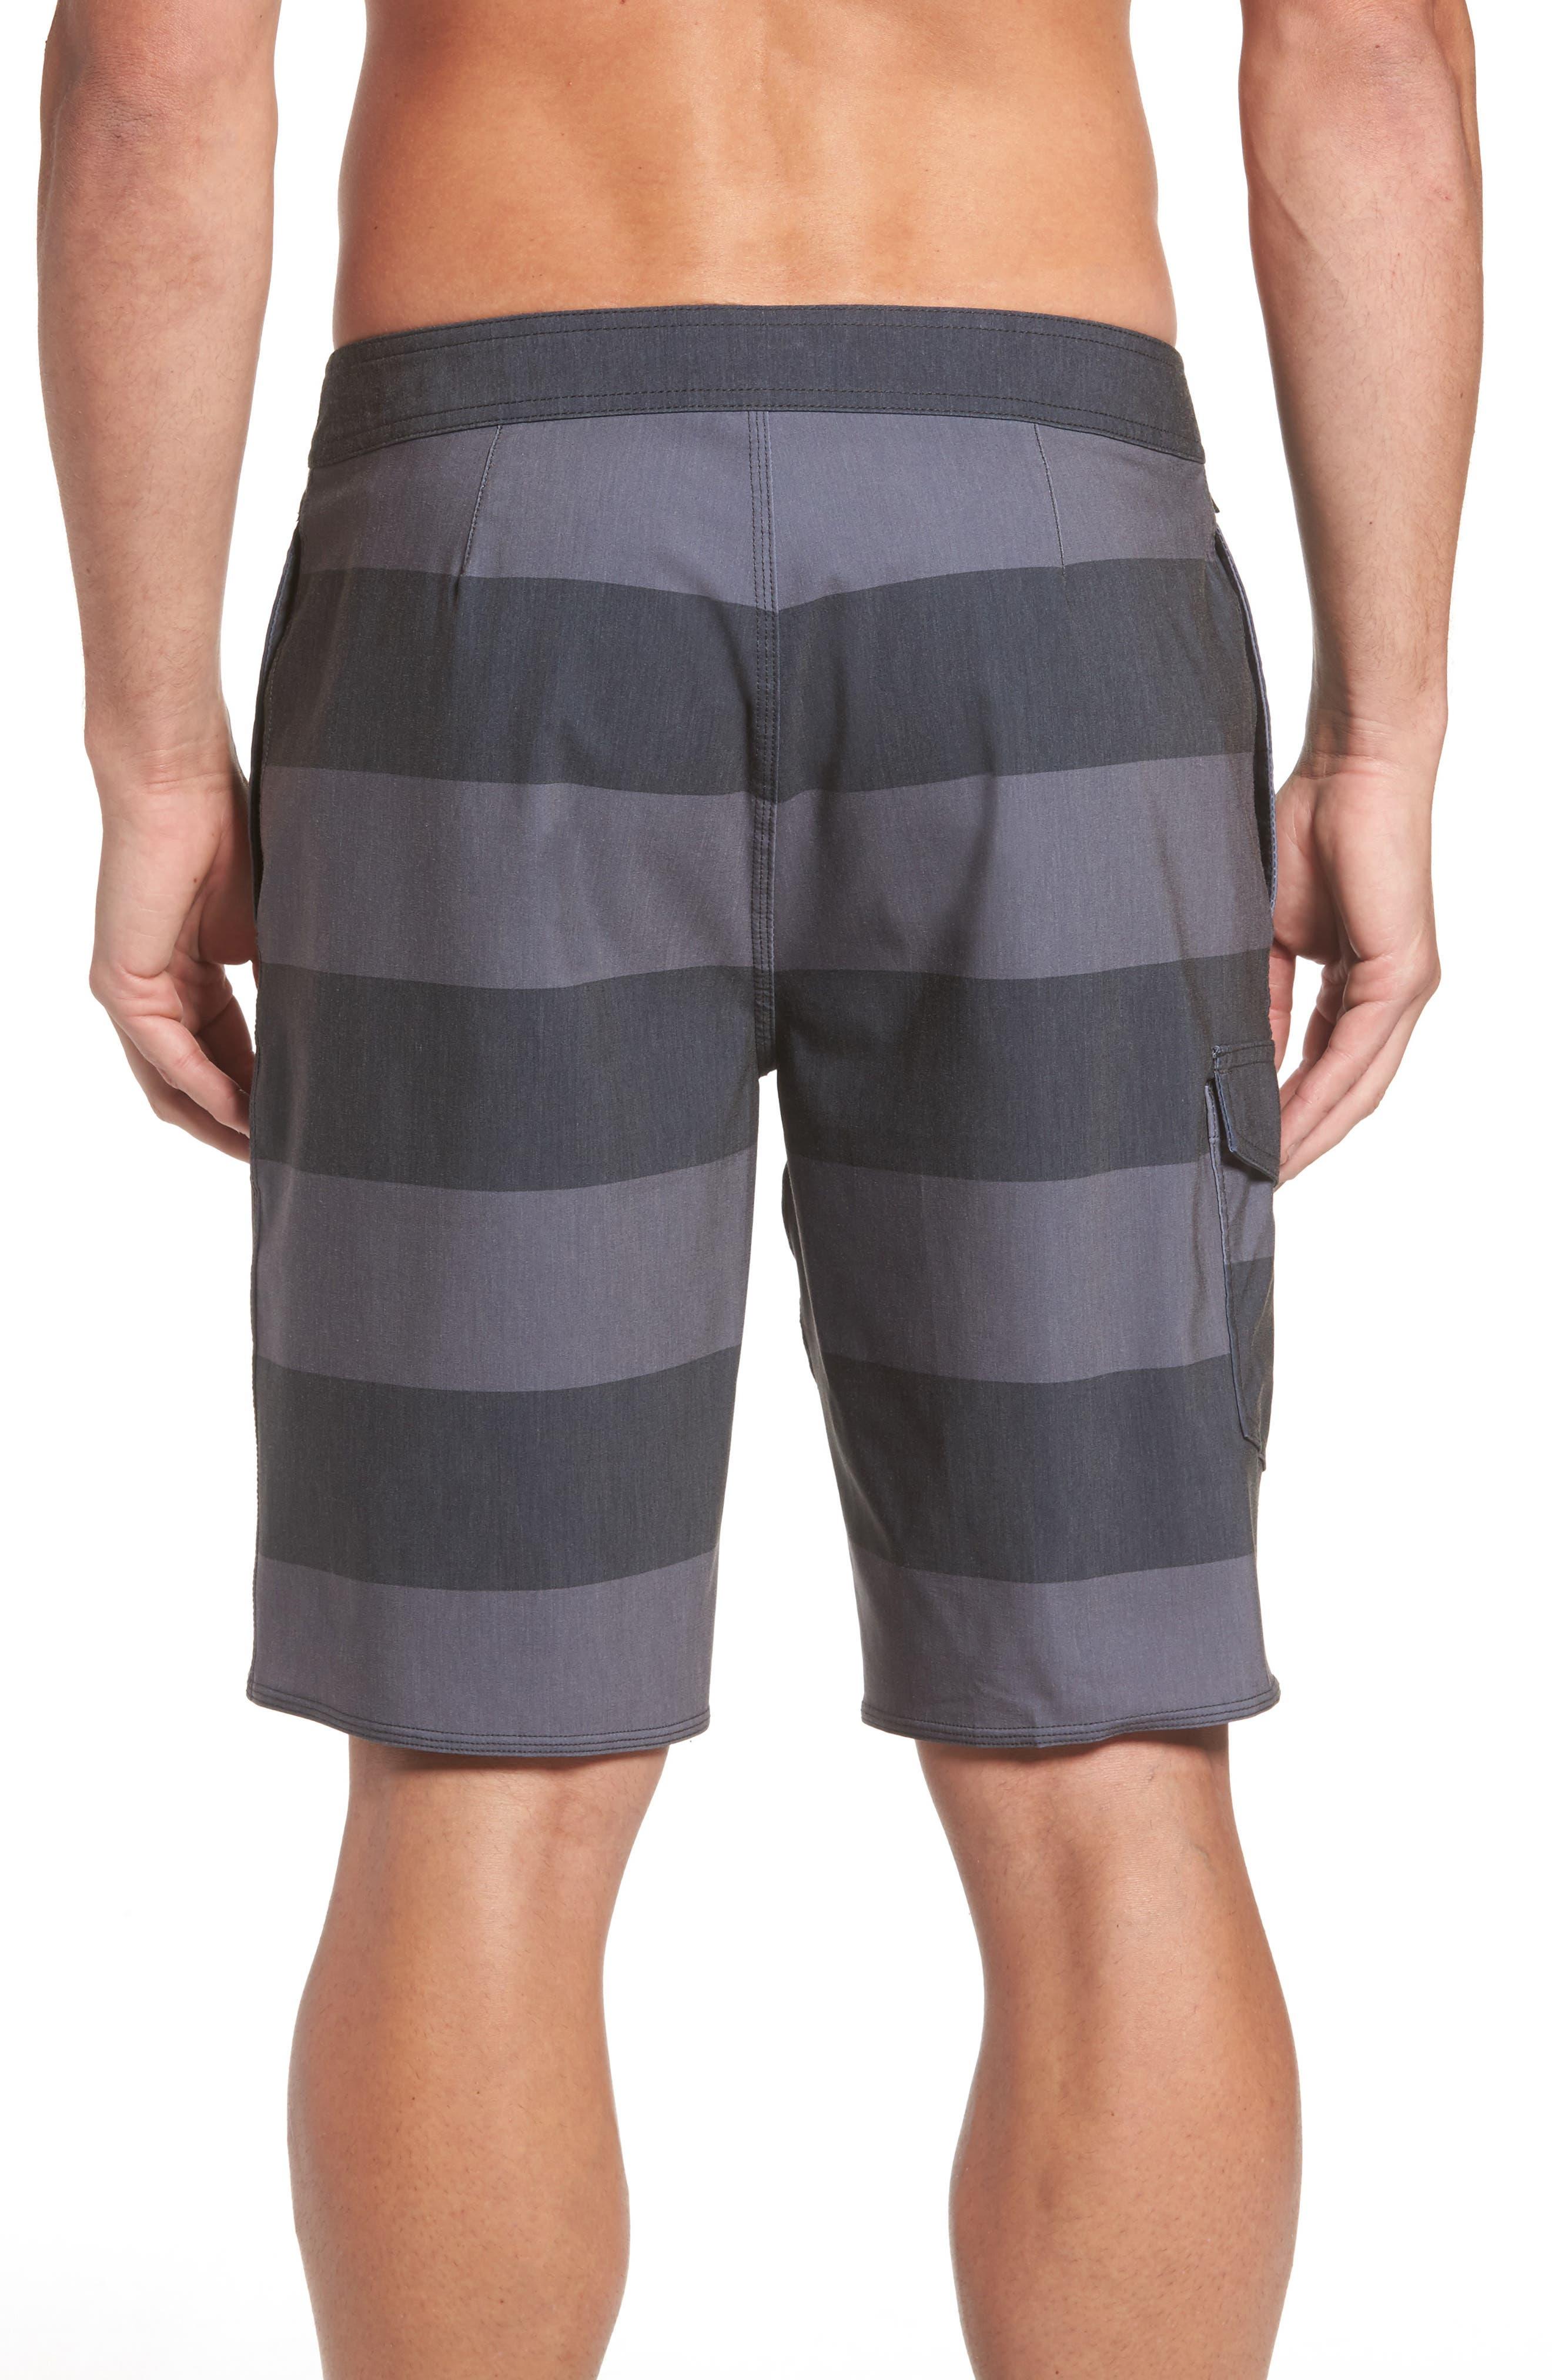 Homage Board Shorts,                             Alternate thumbnail 2, color,                             Black